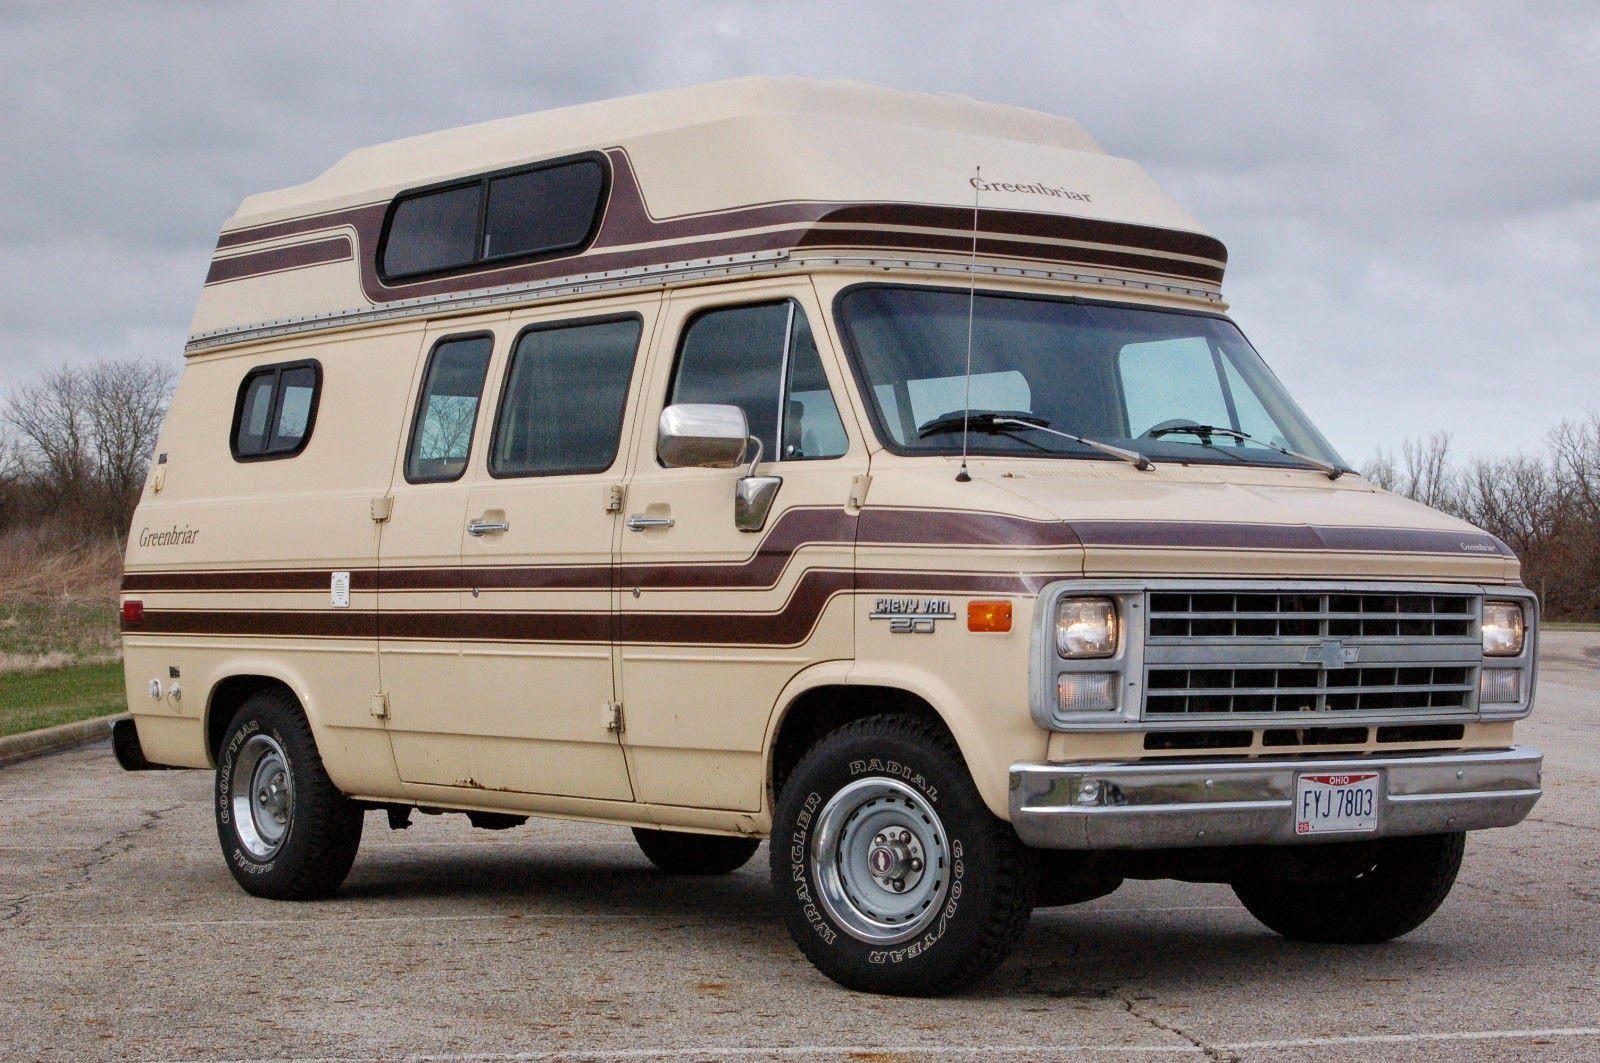 1985 Chevrolet G20 Greenbriar Van